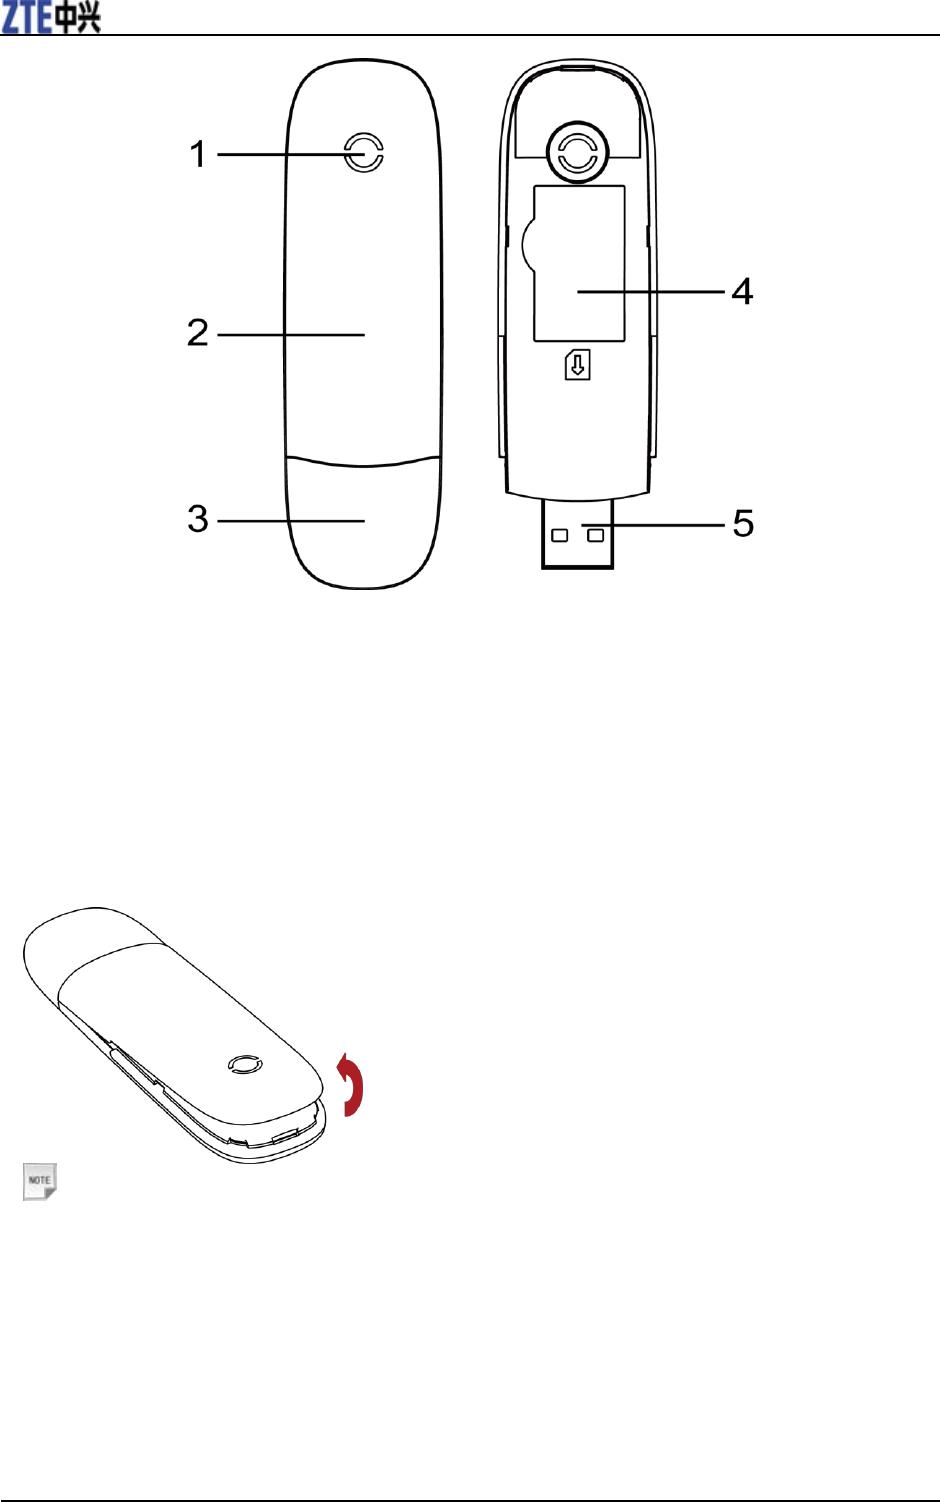 ZTE ZTEMF190 HSUPA USB Stick User Manual MF190